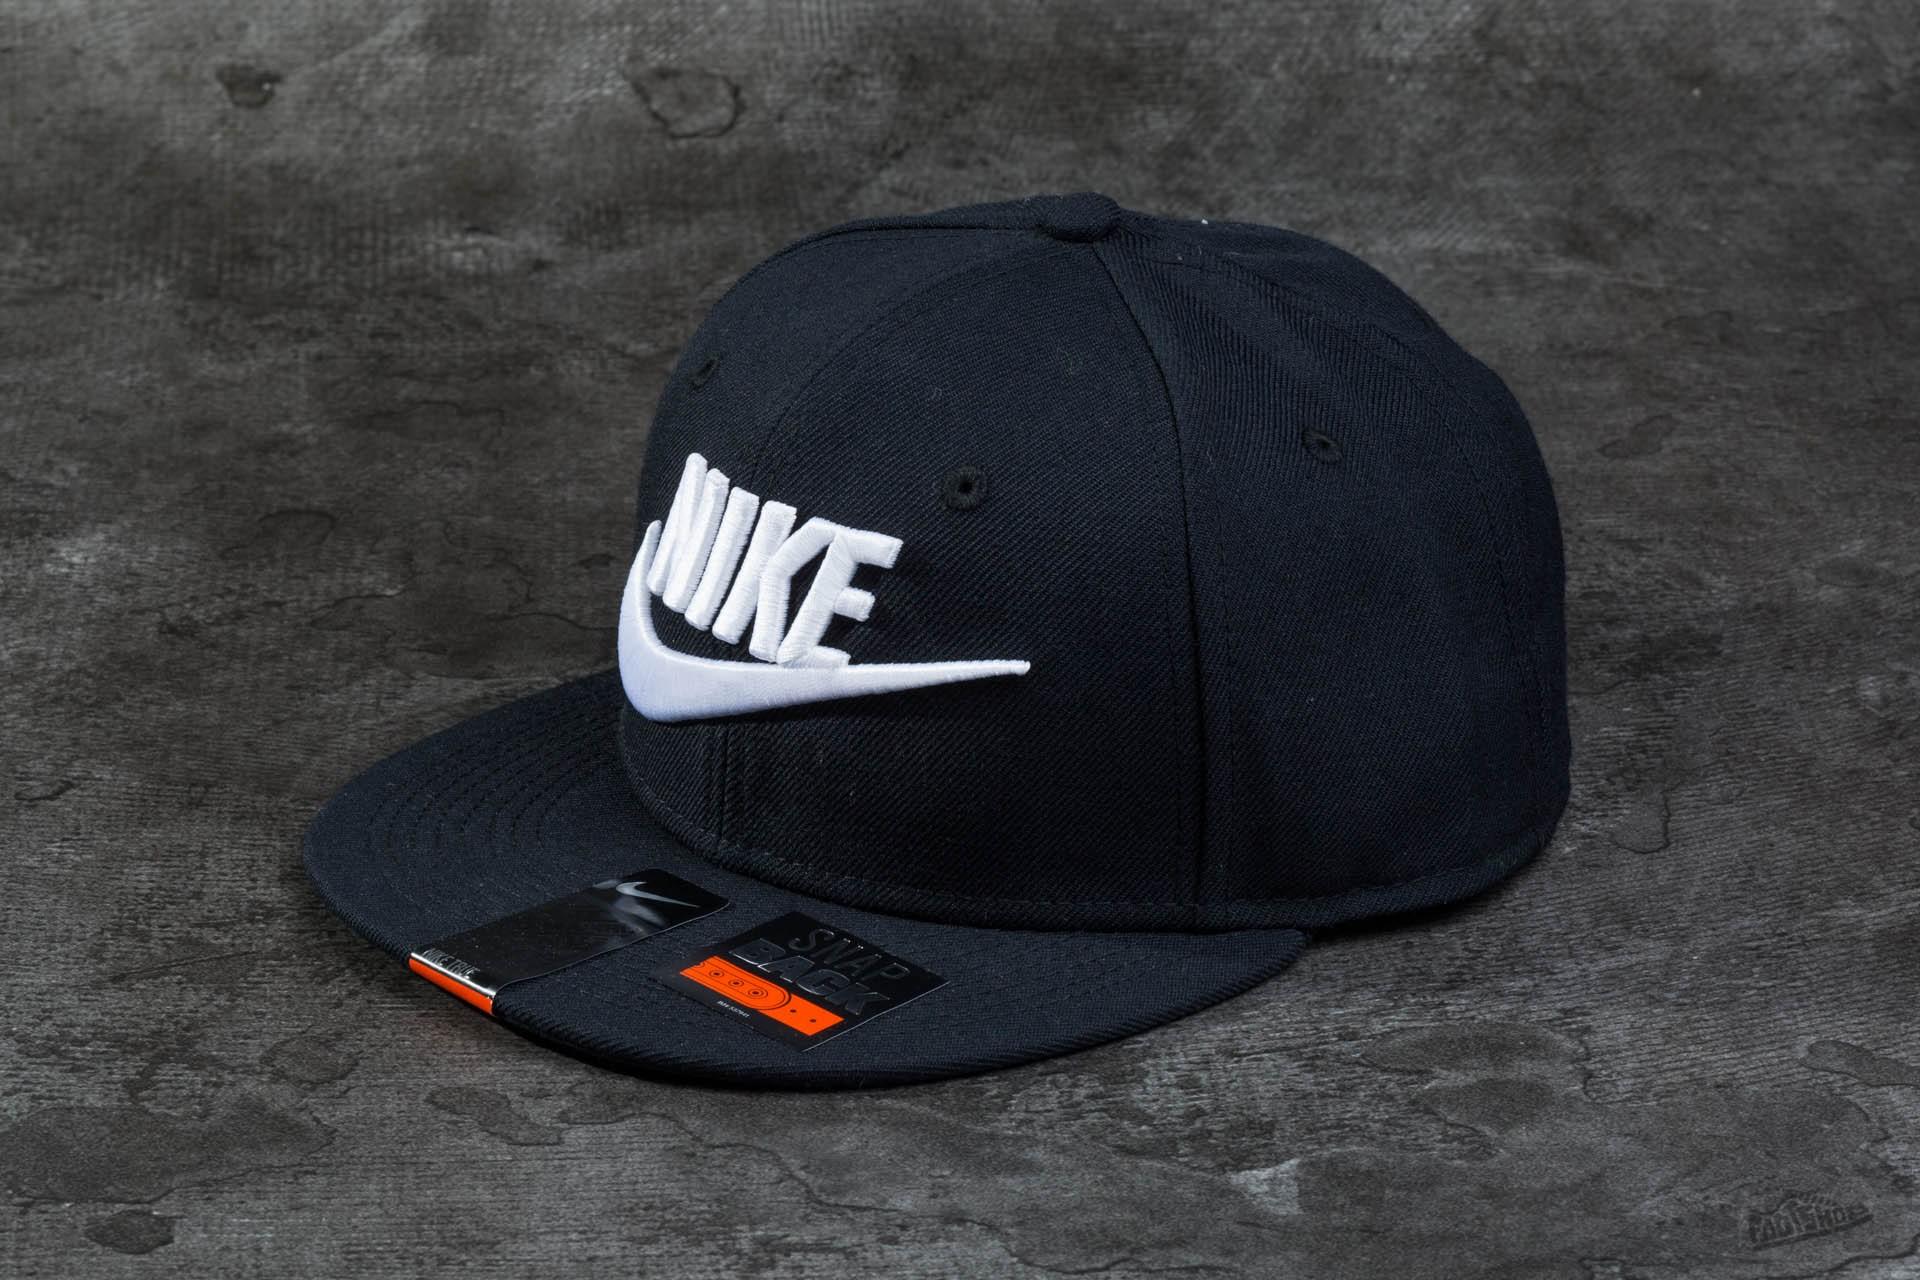 Nido receta billetera  Gorras Nike Limitless True Snapback Black   Footshop